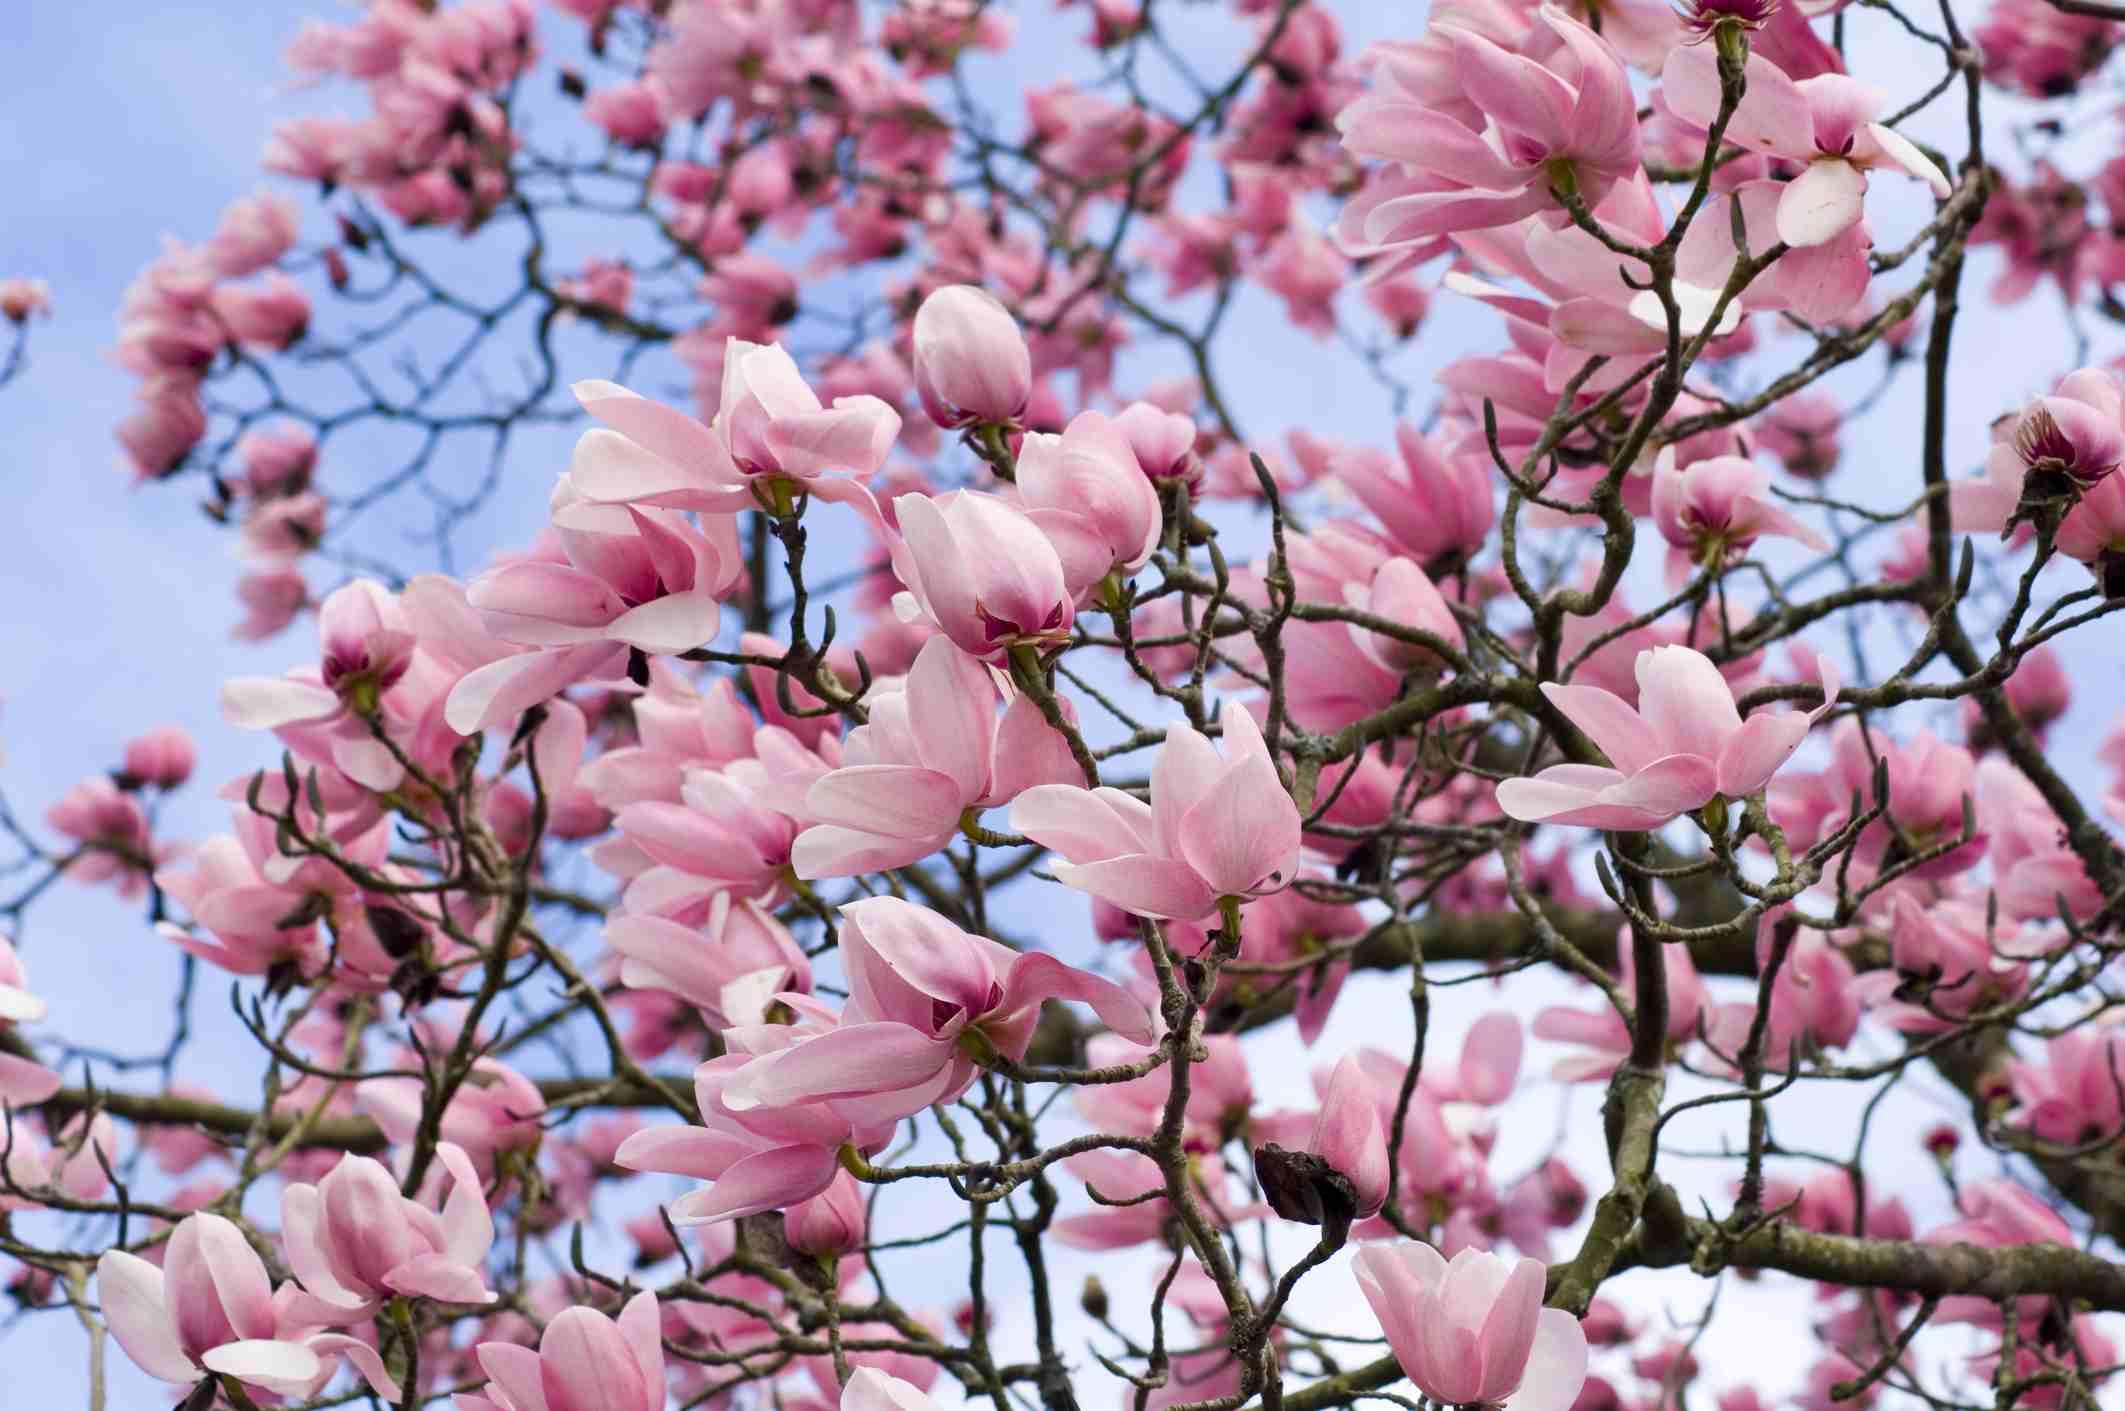 Magnolia tree in bloom